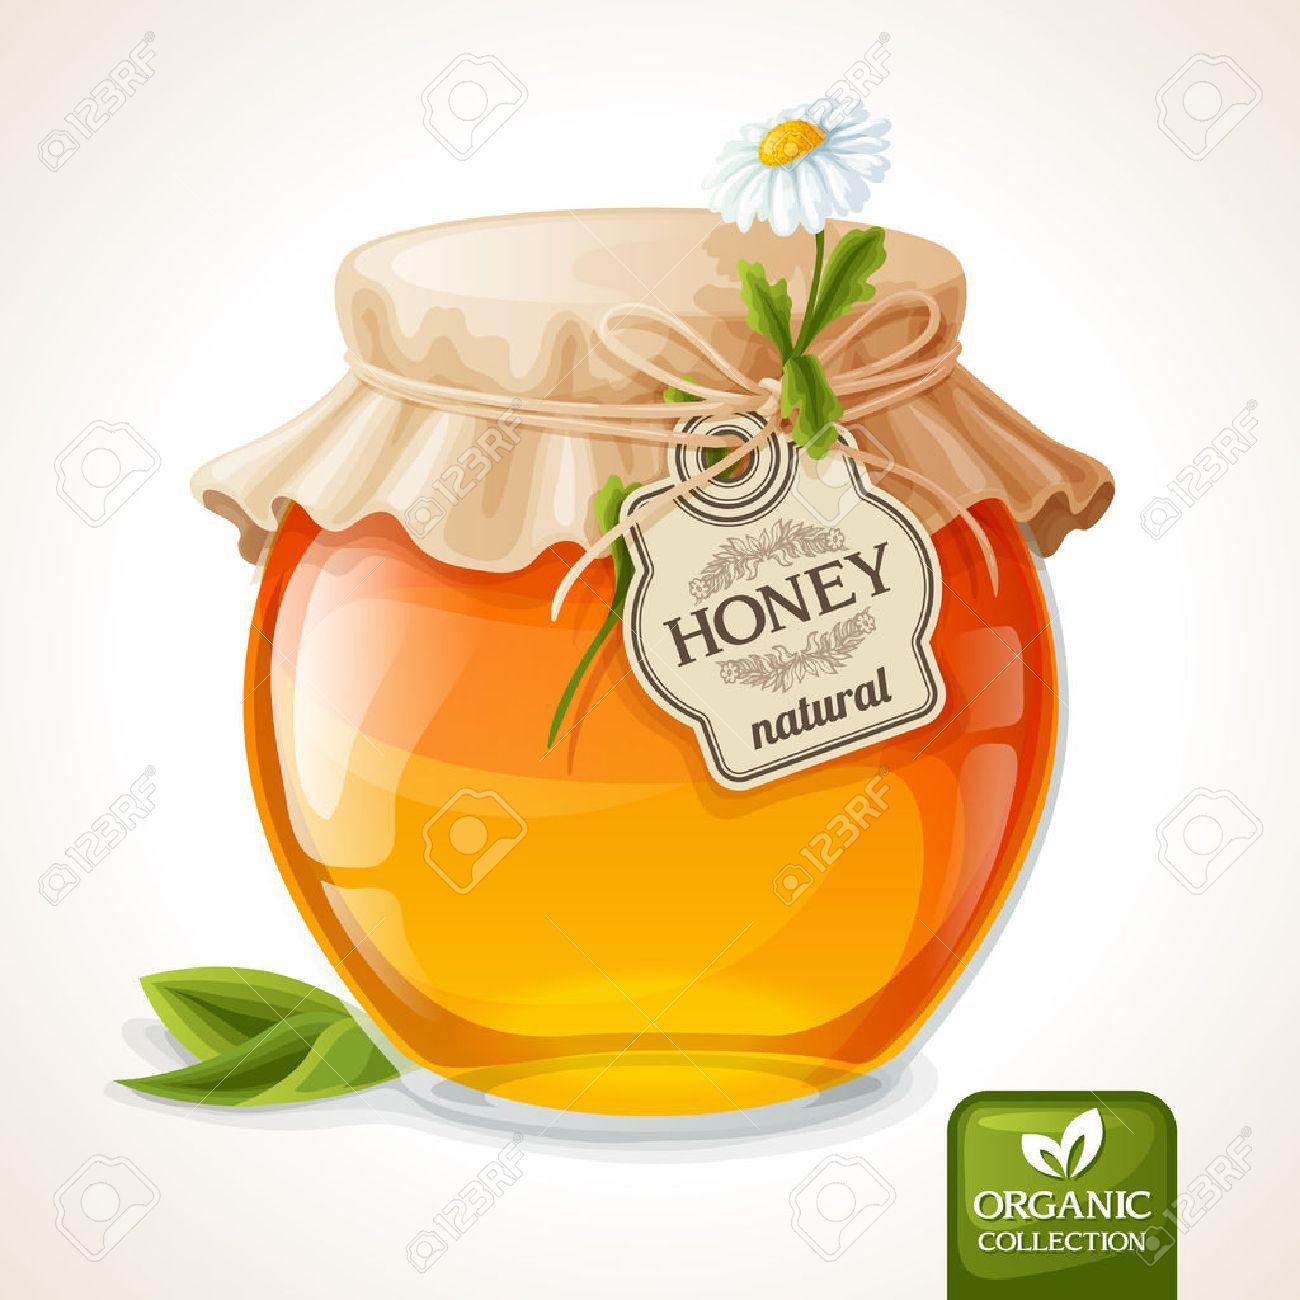 Natural Sweet Golden Organic Honey In Glass Jar With Tag And Paper Cover Vector Illustration Affiliate Organic Ho Envasado De Miel Miel Diseno De Comida